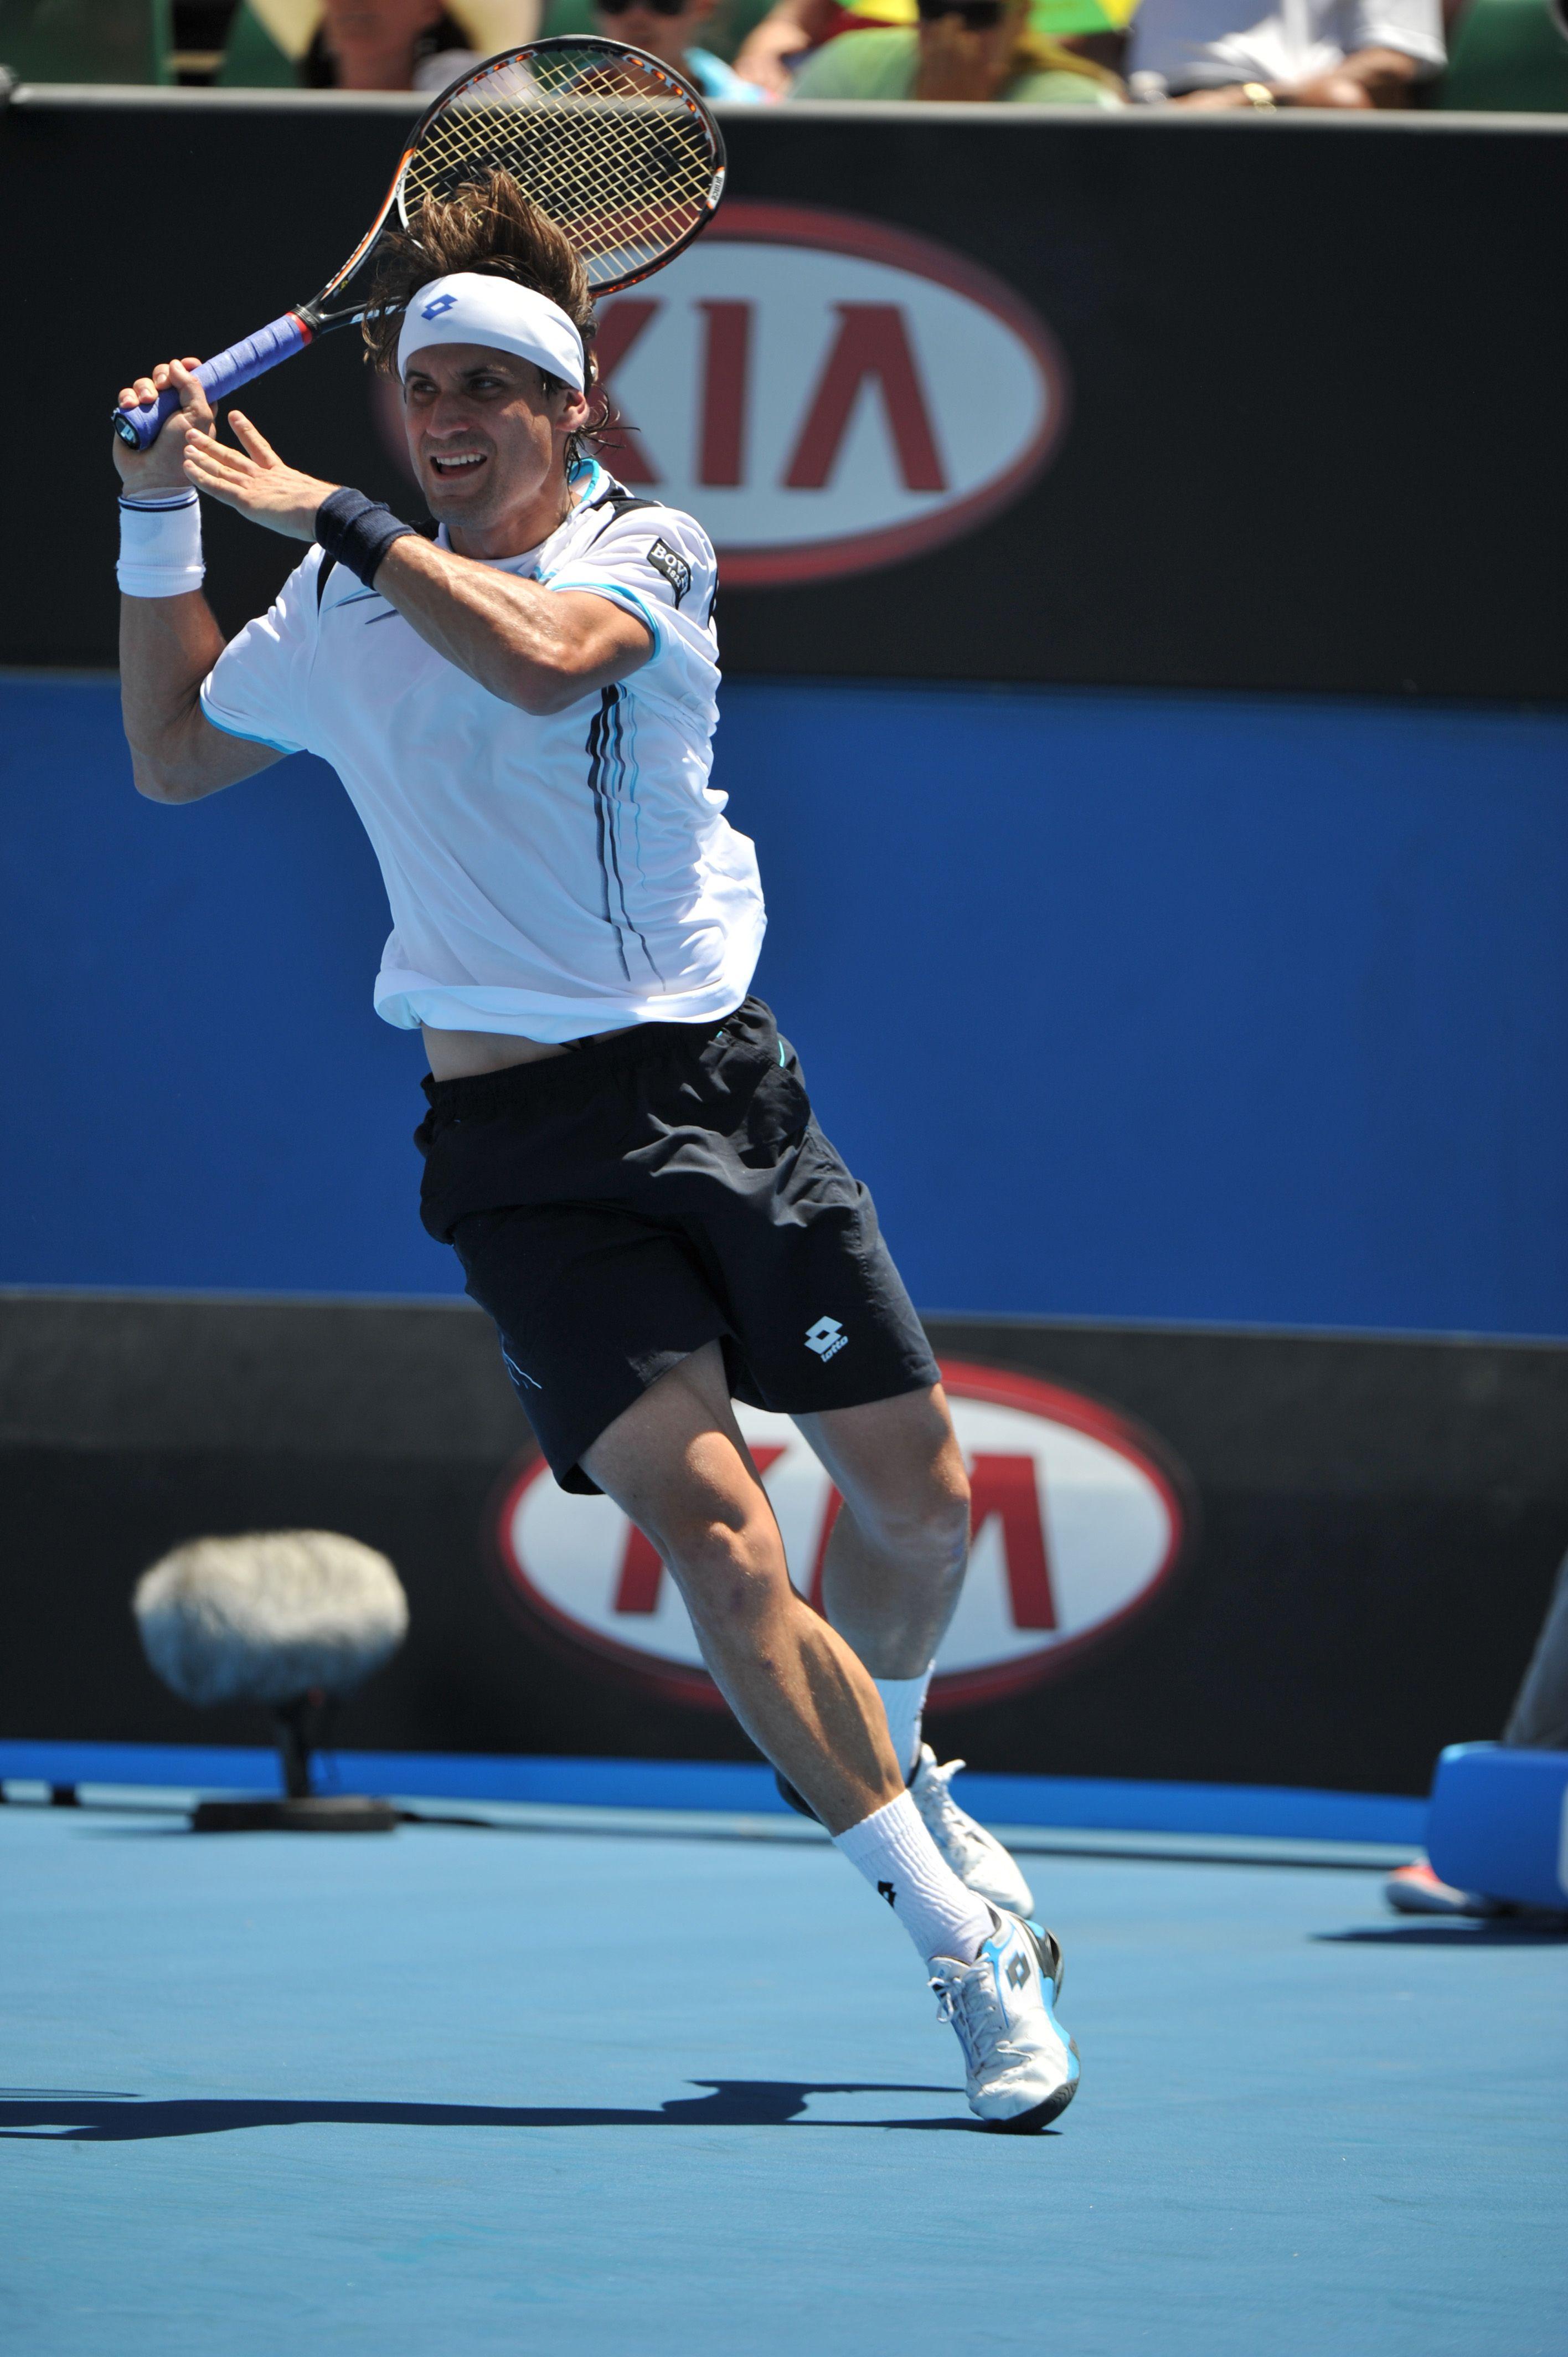 David Ferrer @ Australian Open 2012 - Lotto Sport Italia